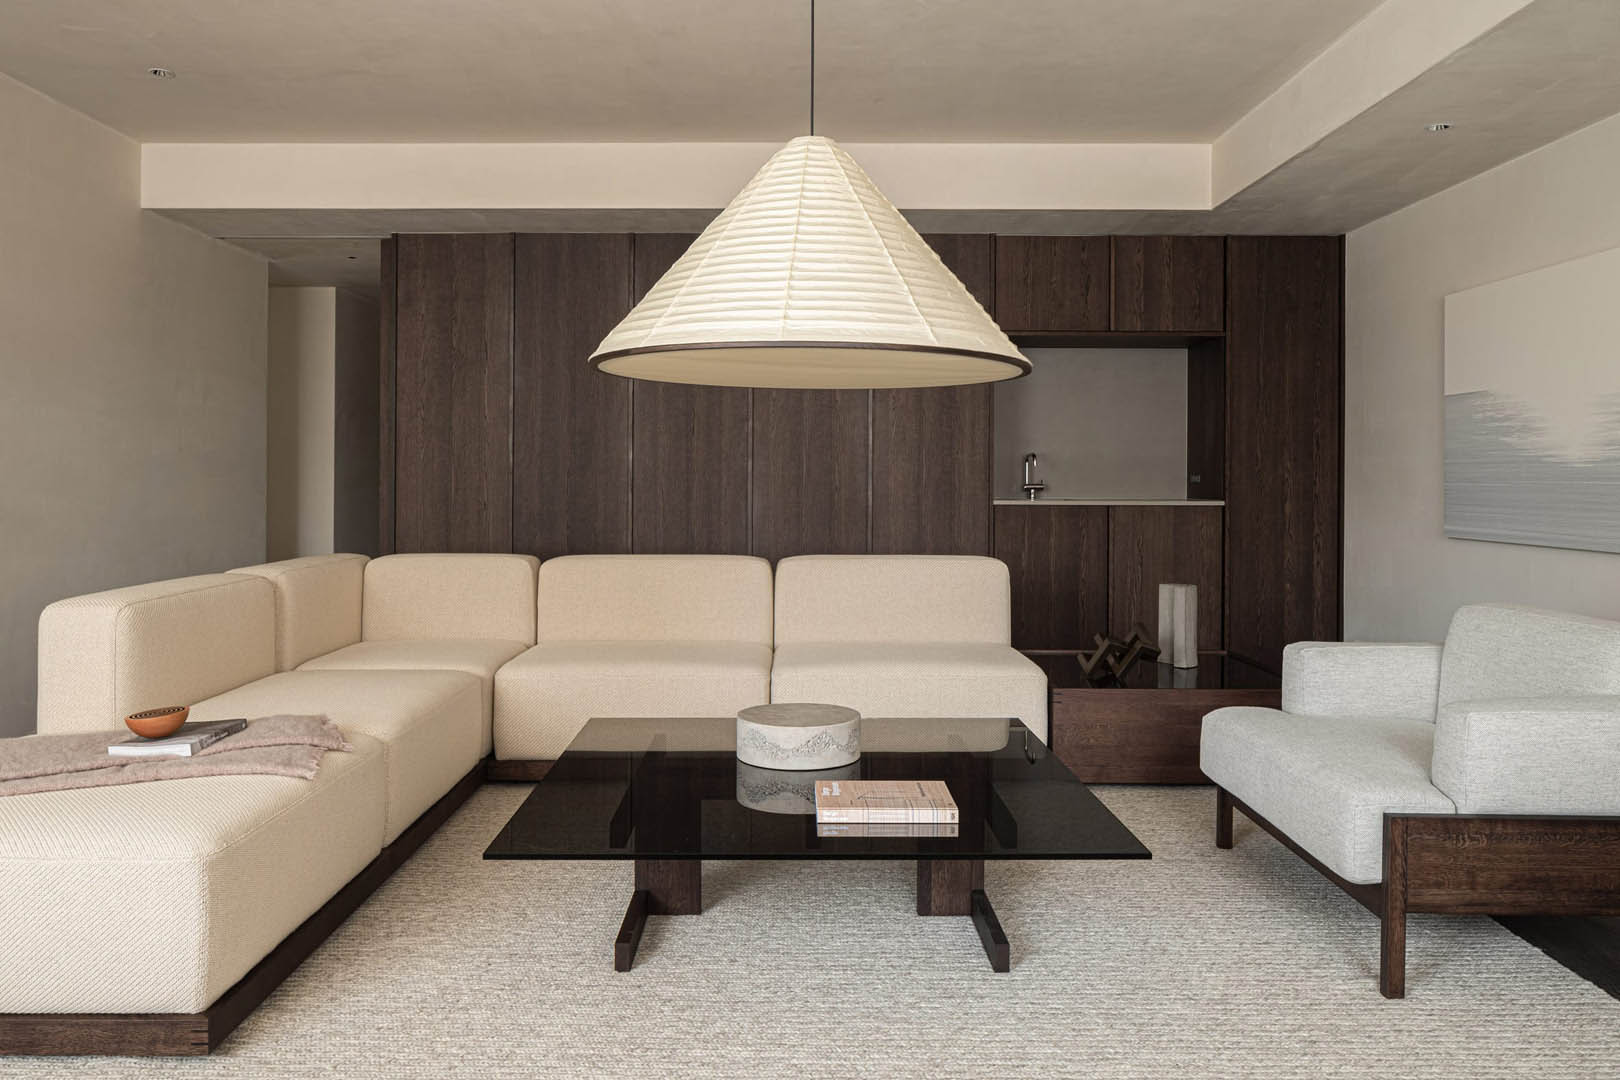 azabu-residence-by-Norm-Architects-and-Keiji-Ashizawa-Design-tokyo_dezeen_2364_col_12